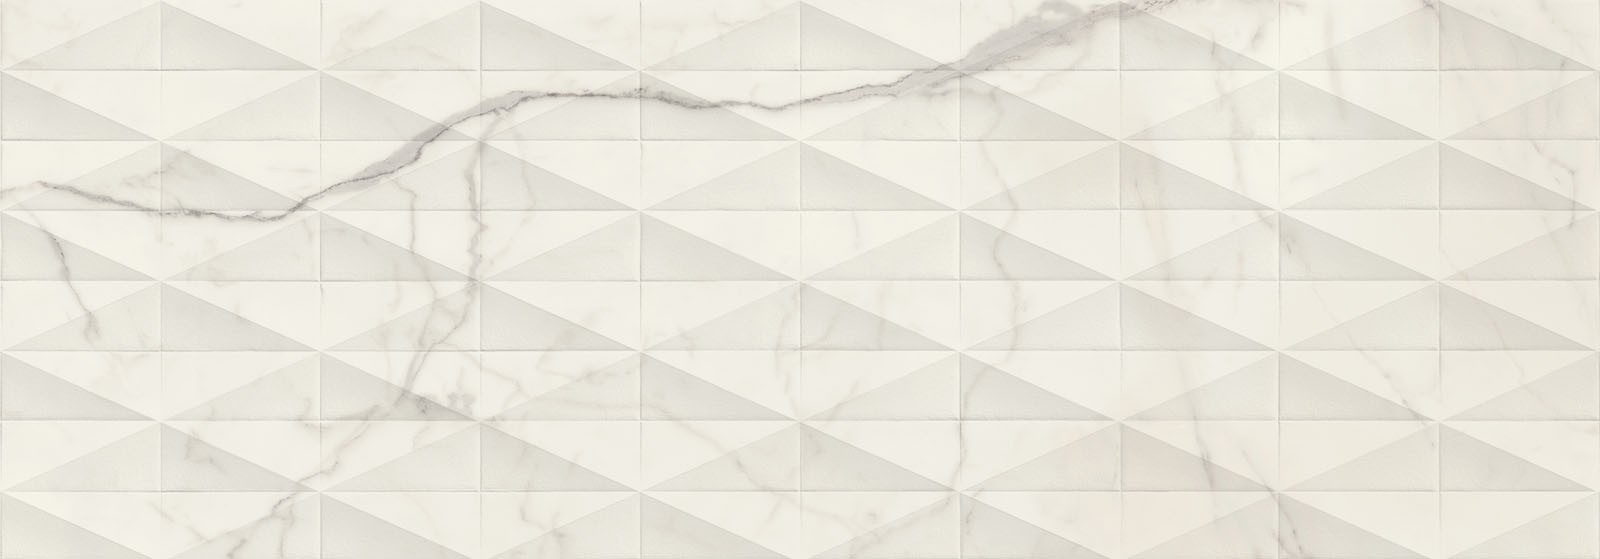 Стенни плочки Allmarble Wall Statuario Struttura Pave 3D Satin 40x120